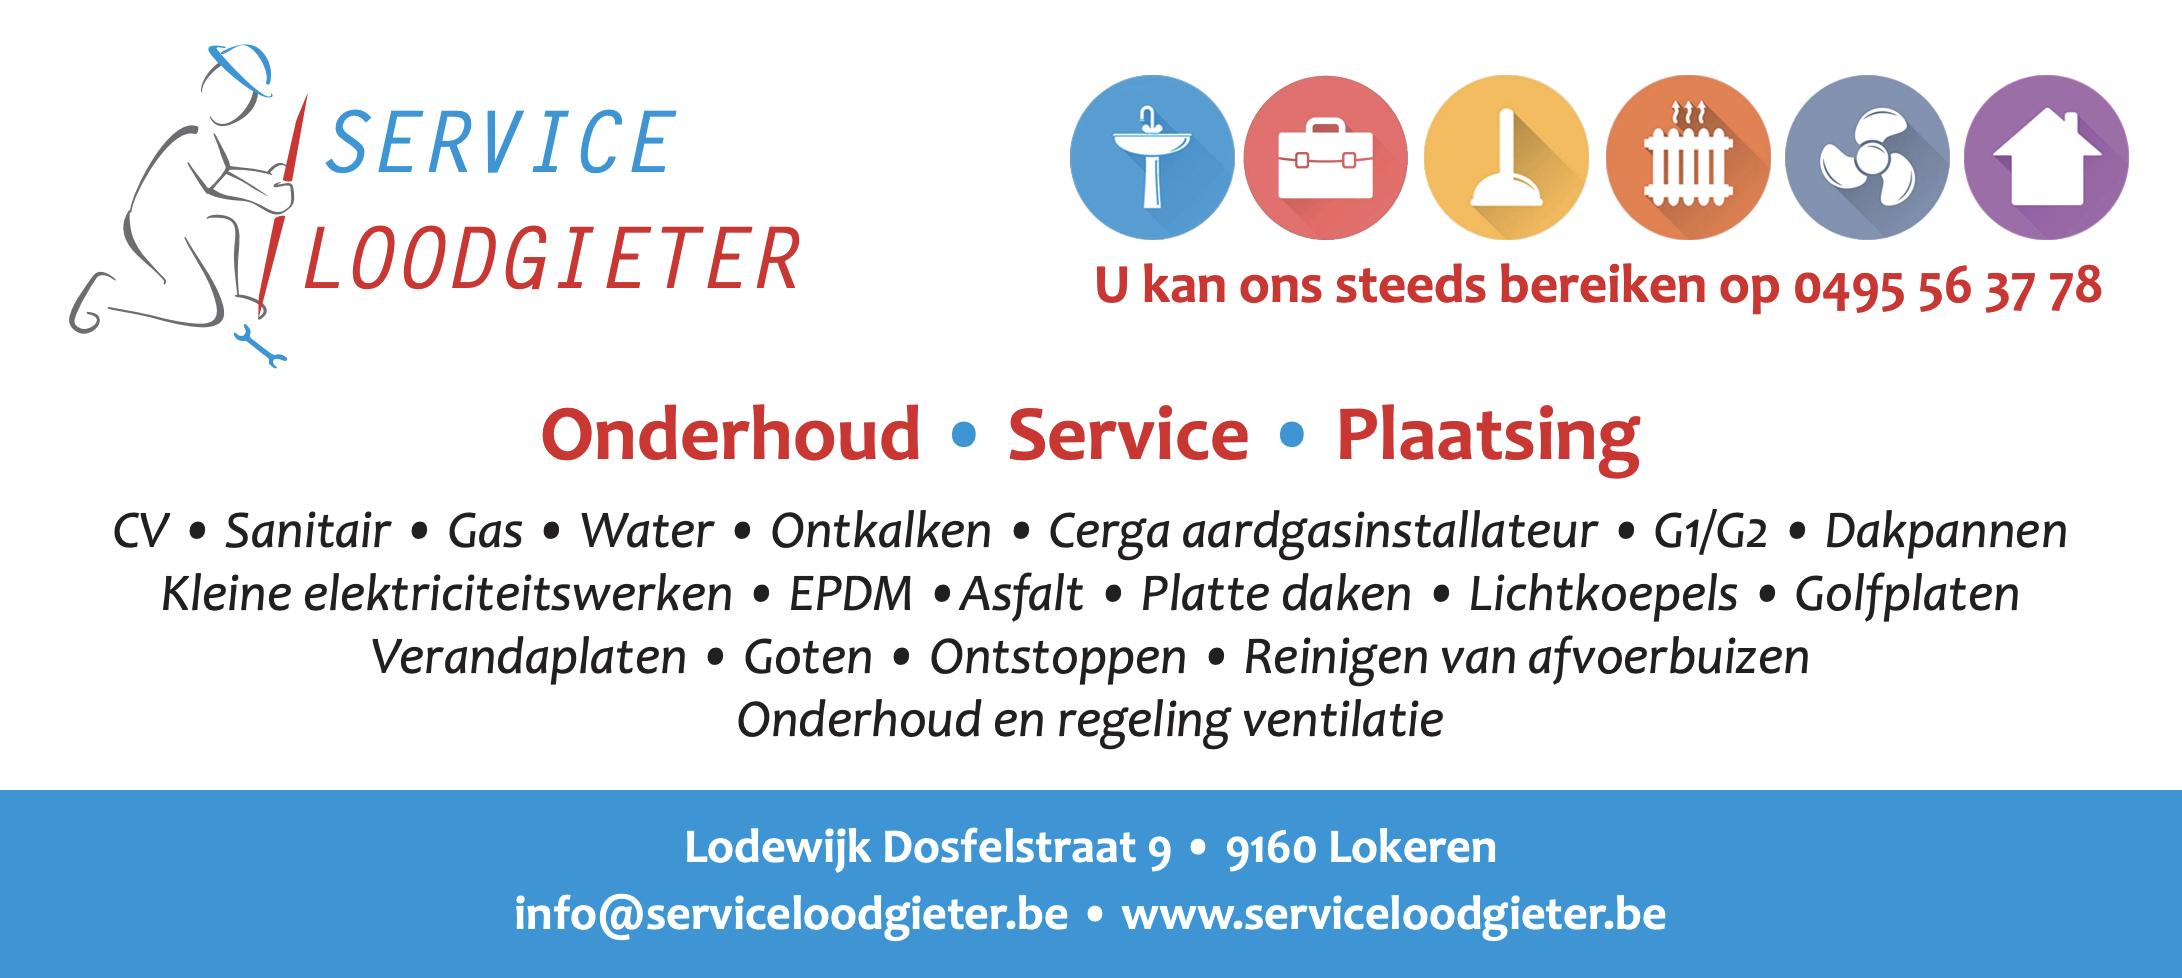 Loodgieter Service